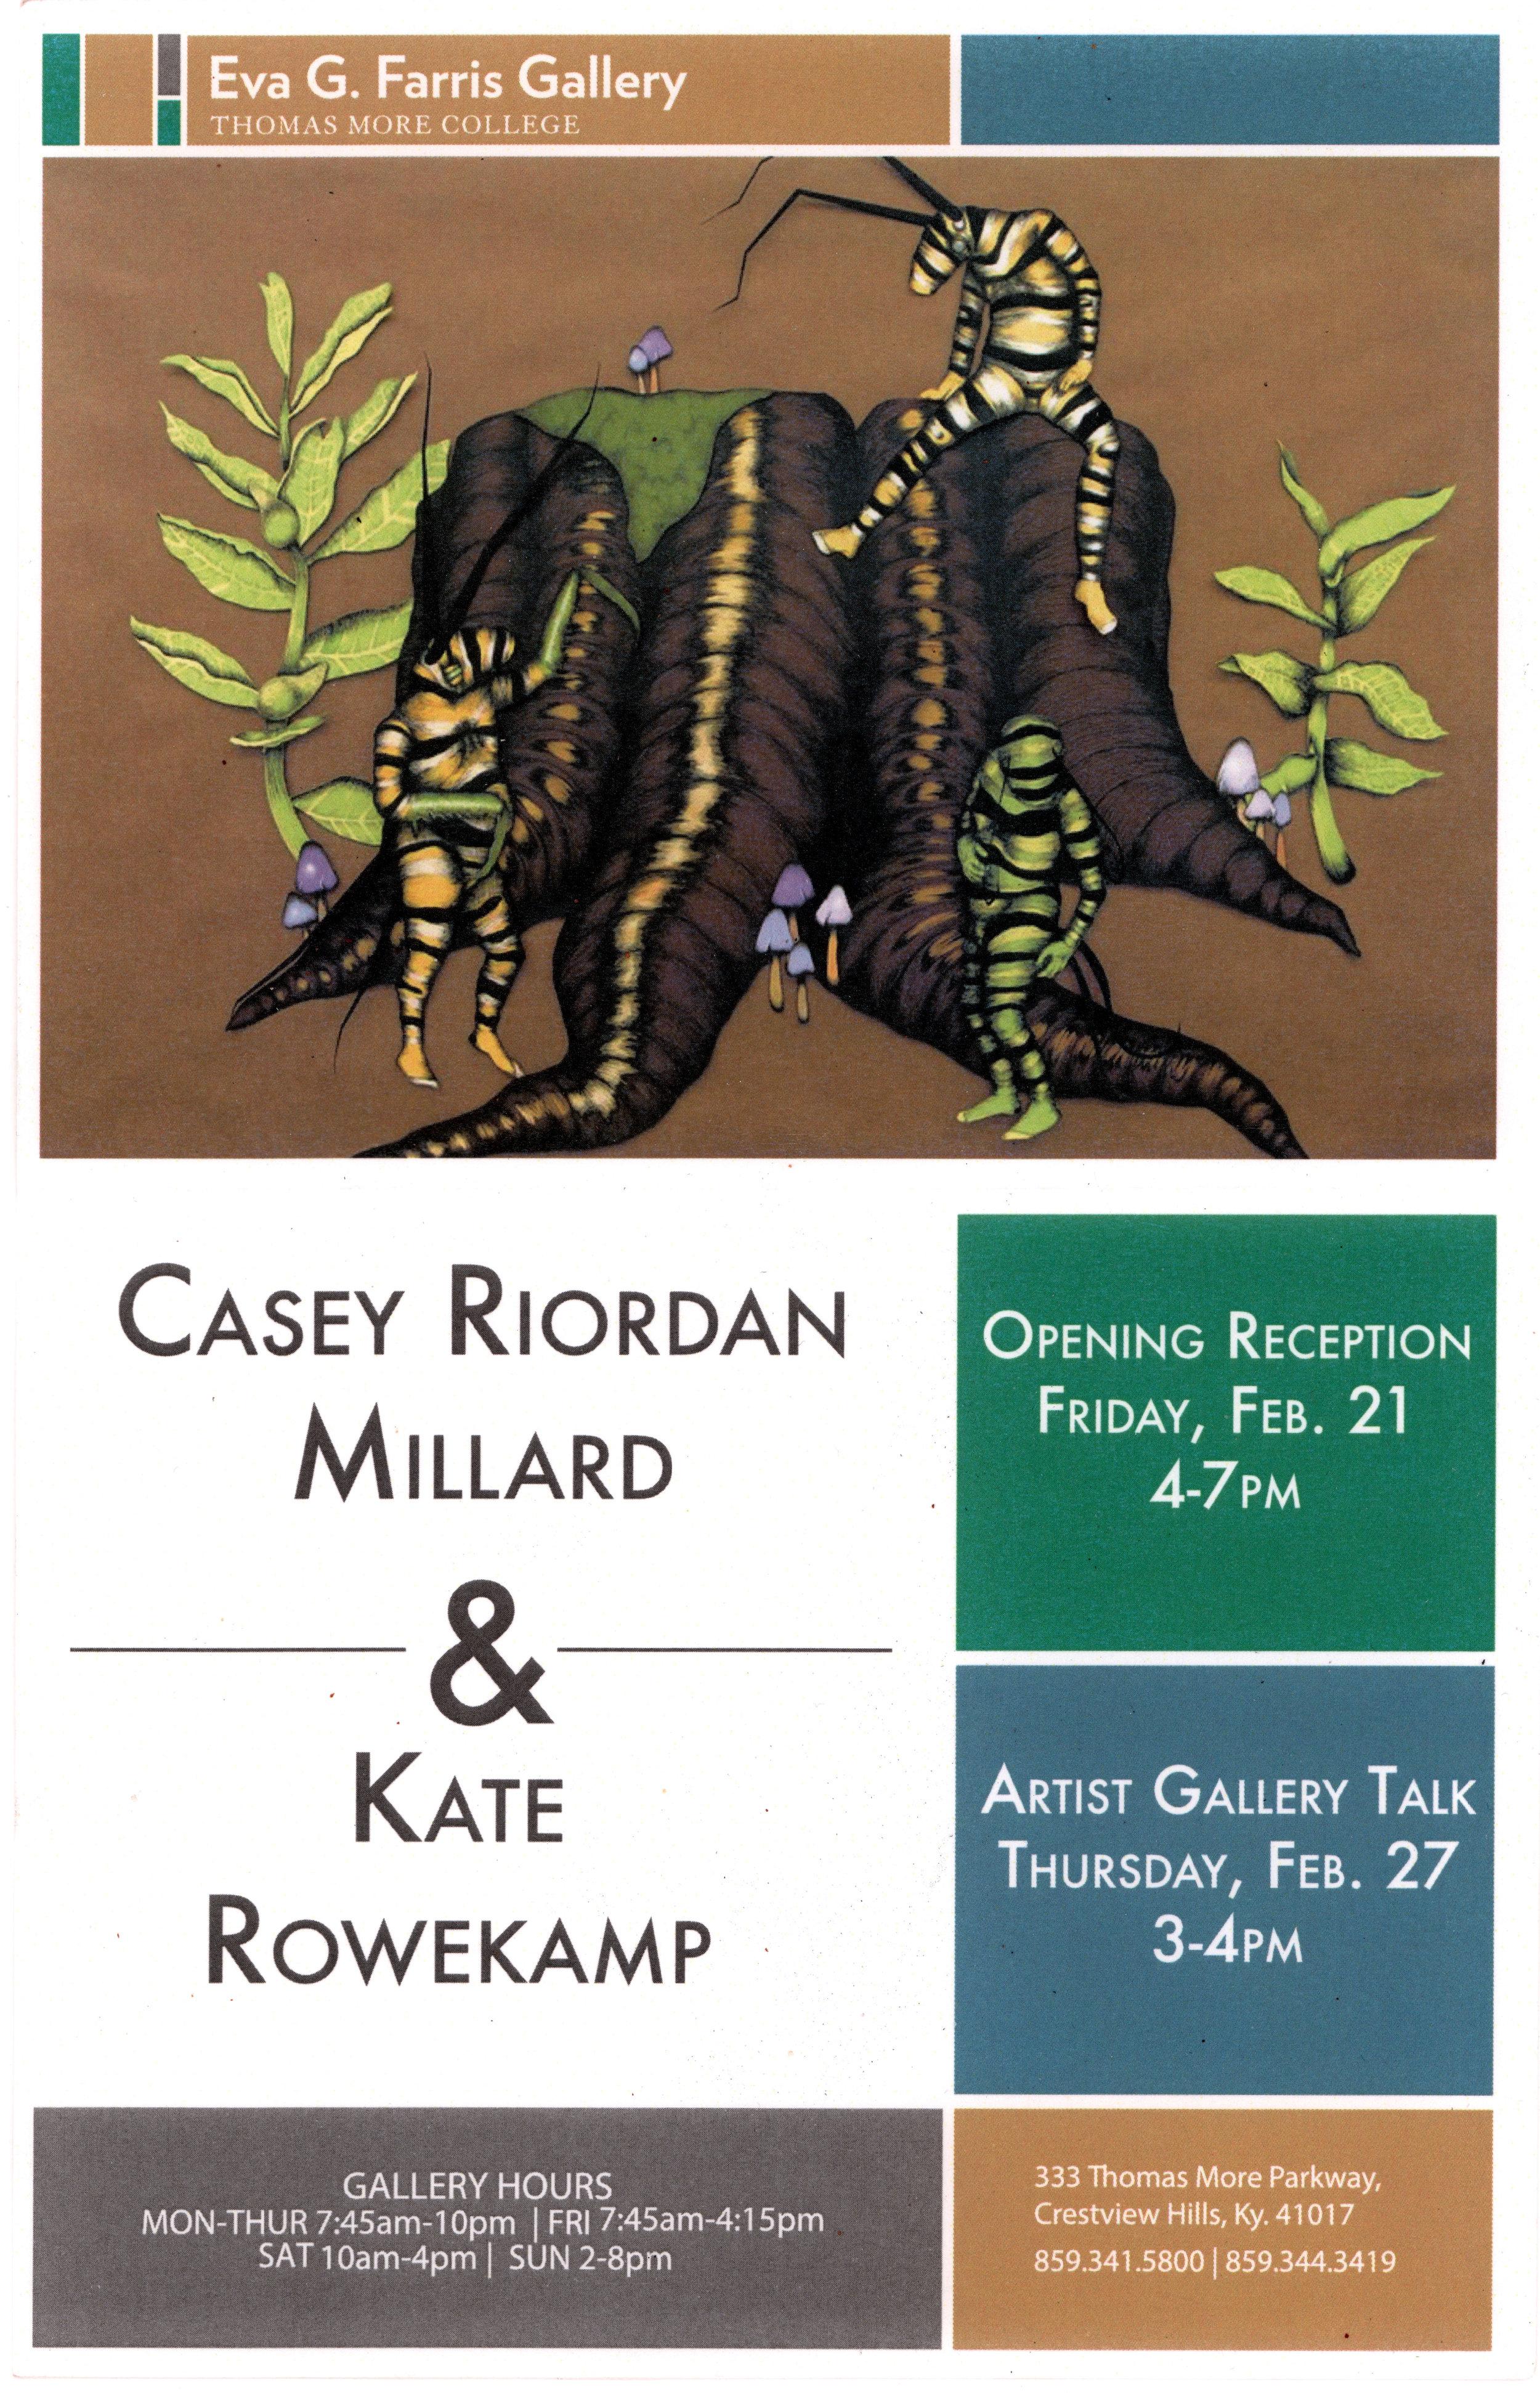 Apprenticeship Show  w/ Master Artist Casey Riordan Millard  February 21, 2014 - March 14, 2014  Artist Talk February 27, 2014  Eva G. Farris Gallery  Crestview Hills, Kentucky